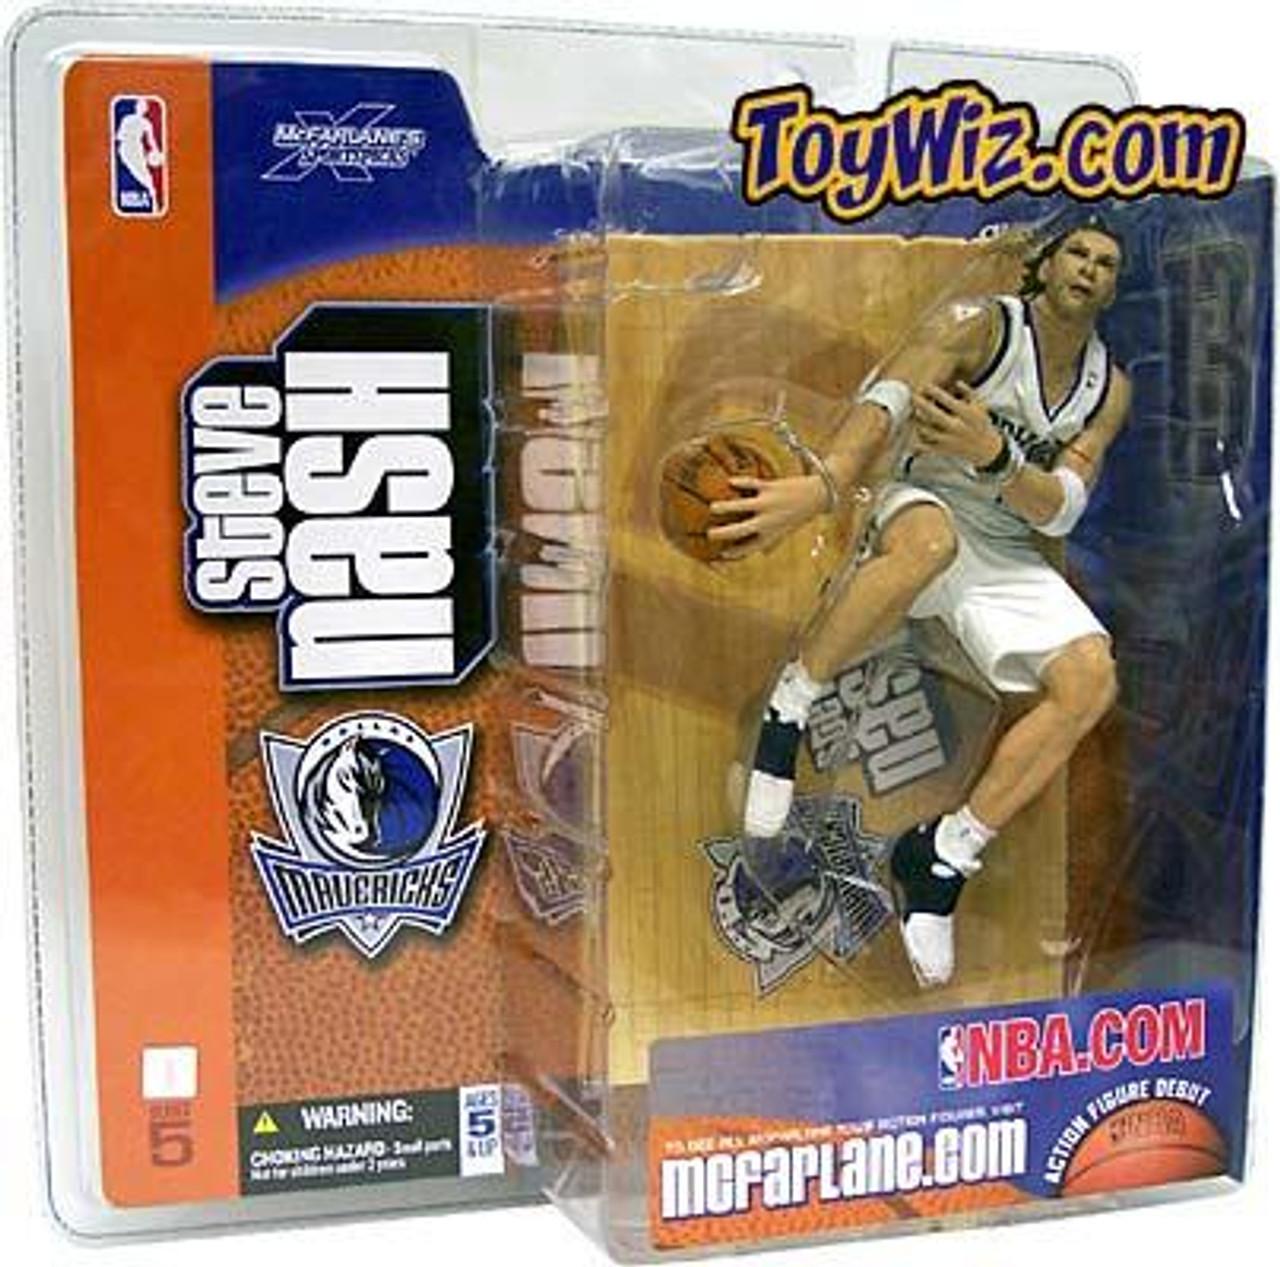 McFarlane Toys NBA Dallas Mavericks Sports Picks Series 5 Steve Nash Action Figure [White Jersey Variant]